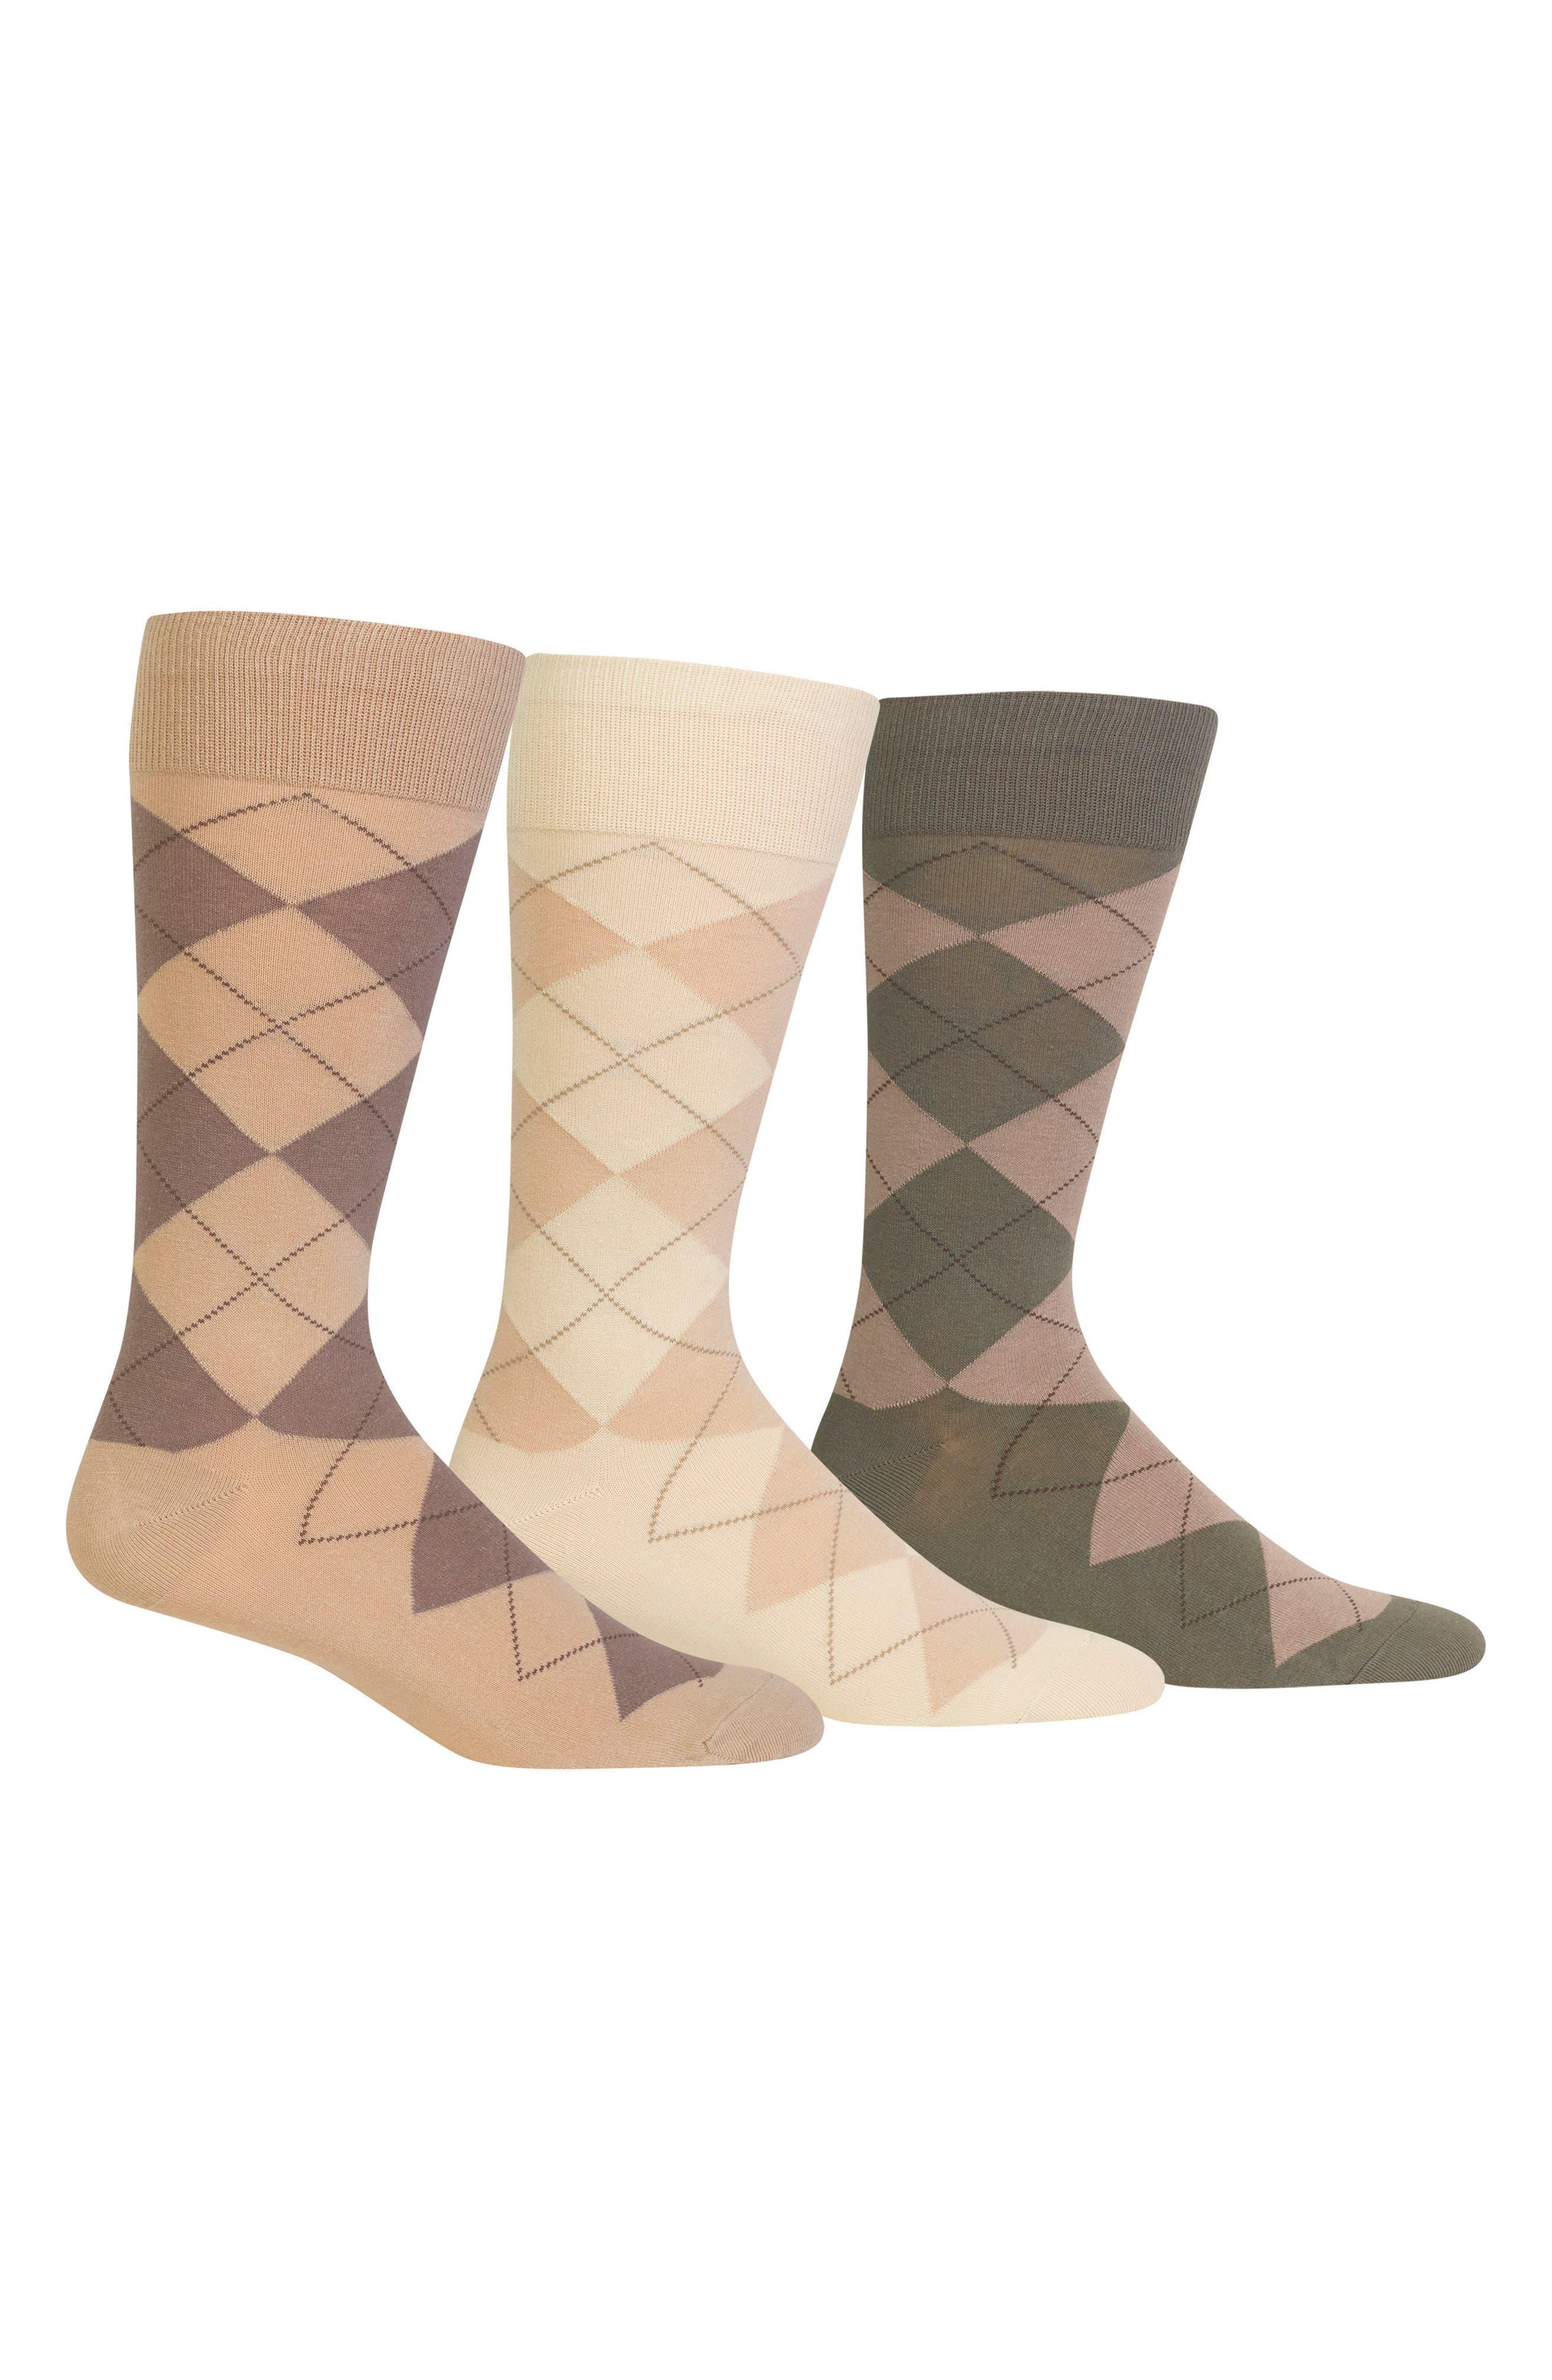 3-Pack Argyle Socks,                         Main,                         color, Lt Coffee/ Bone White/ Tobacco